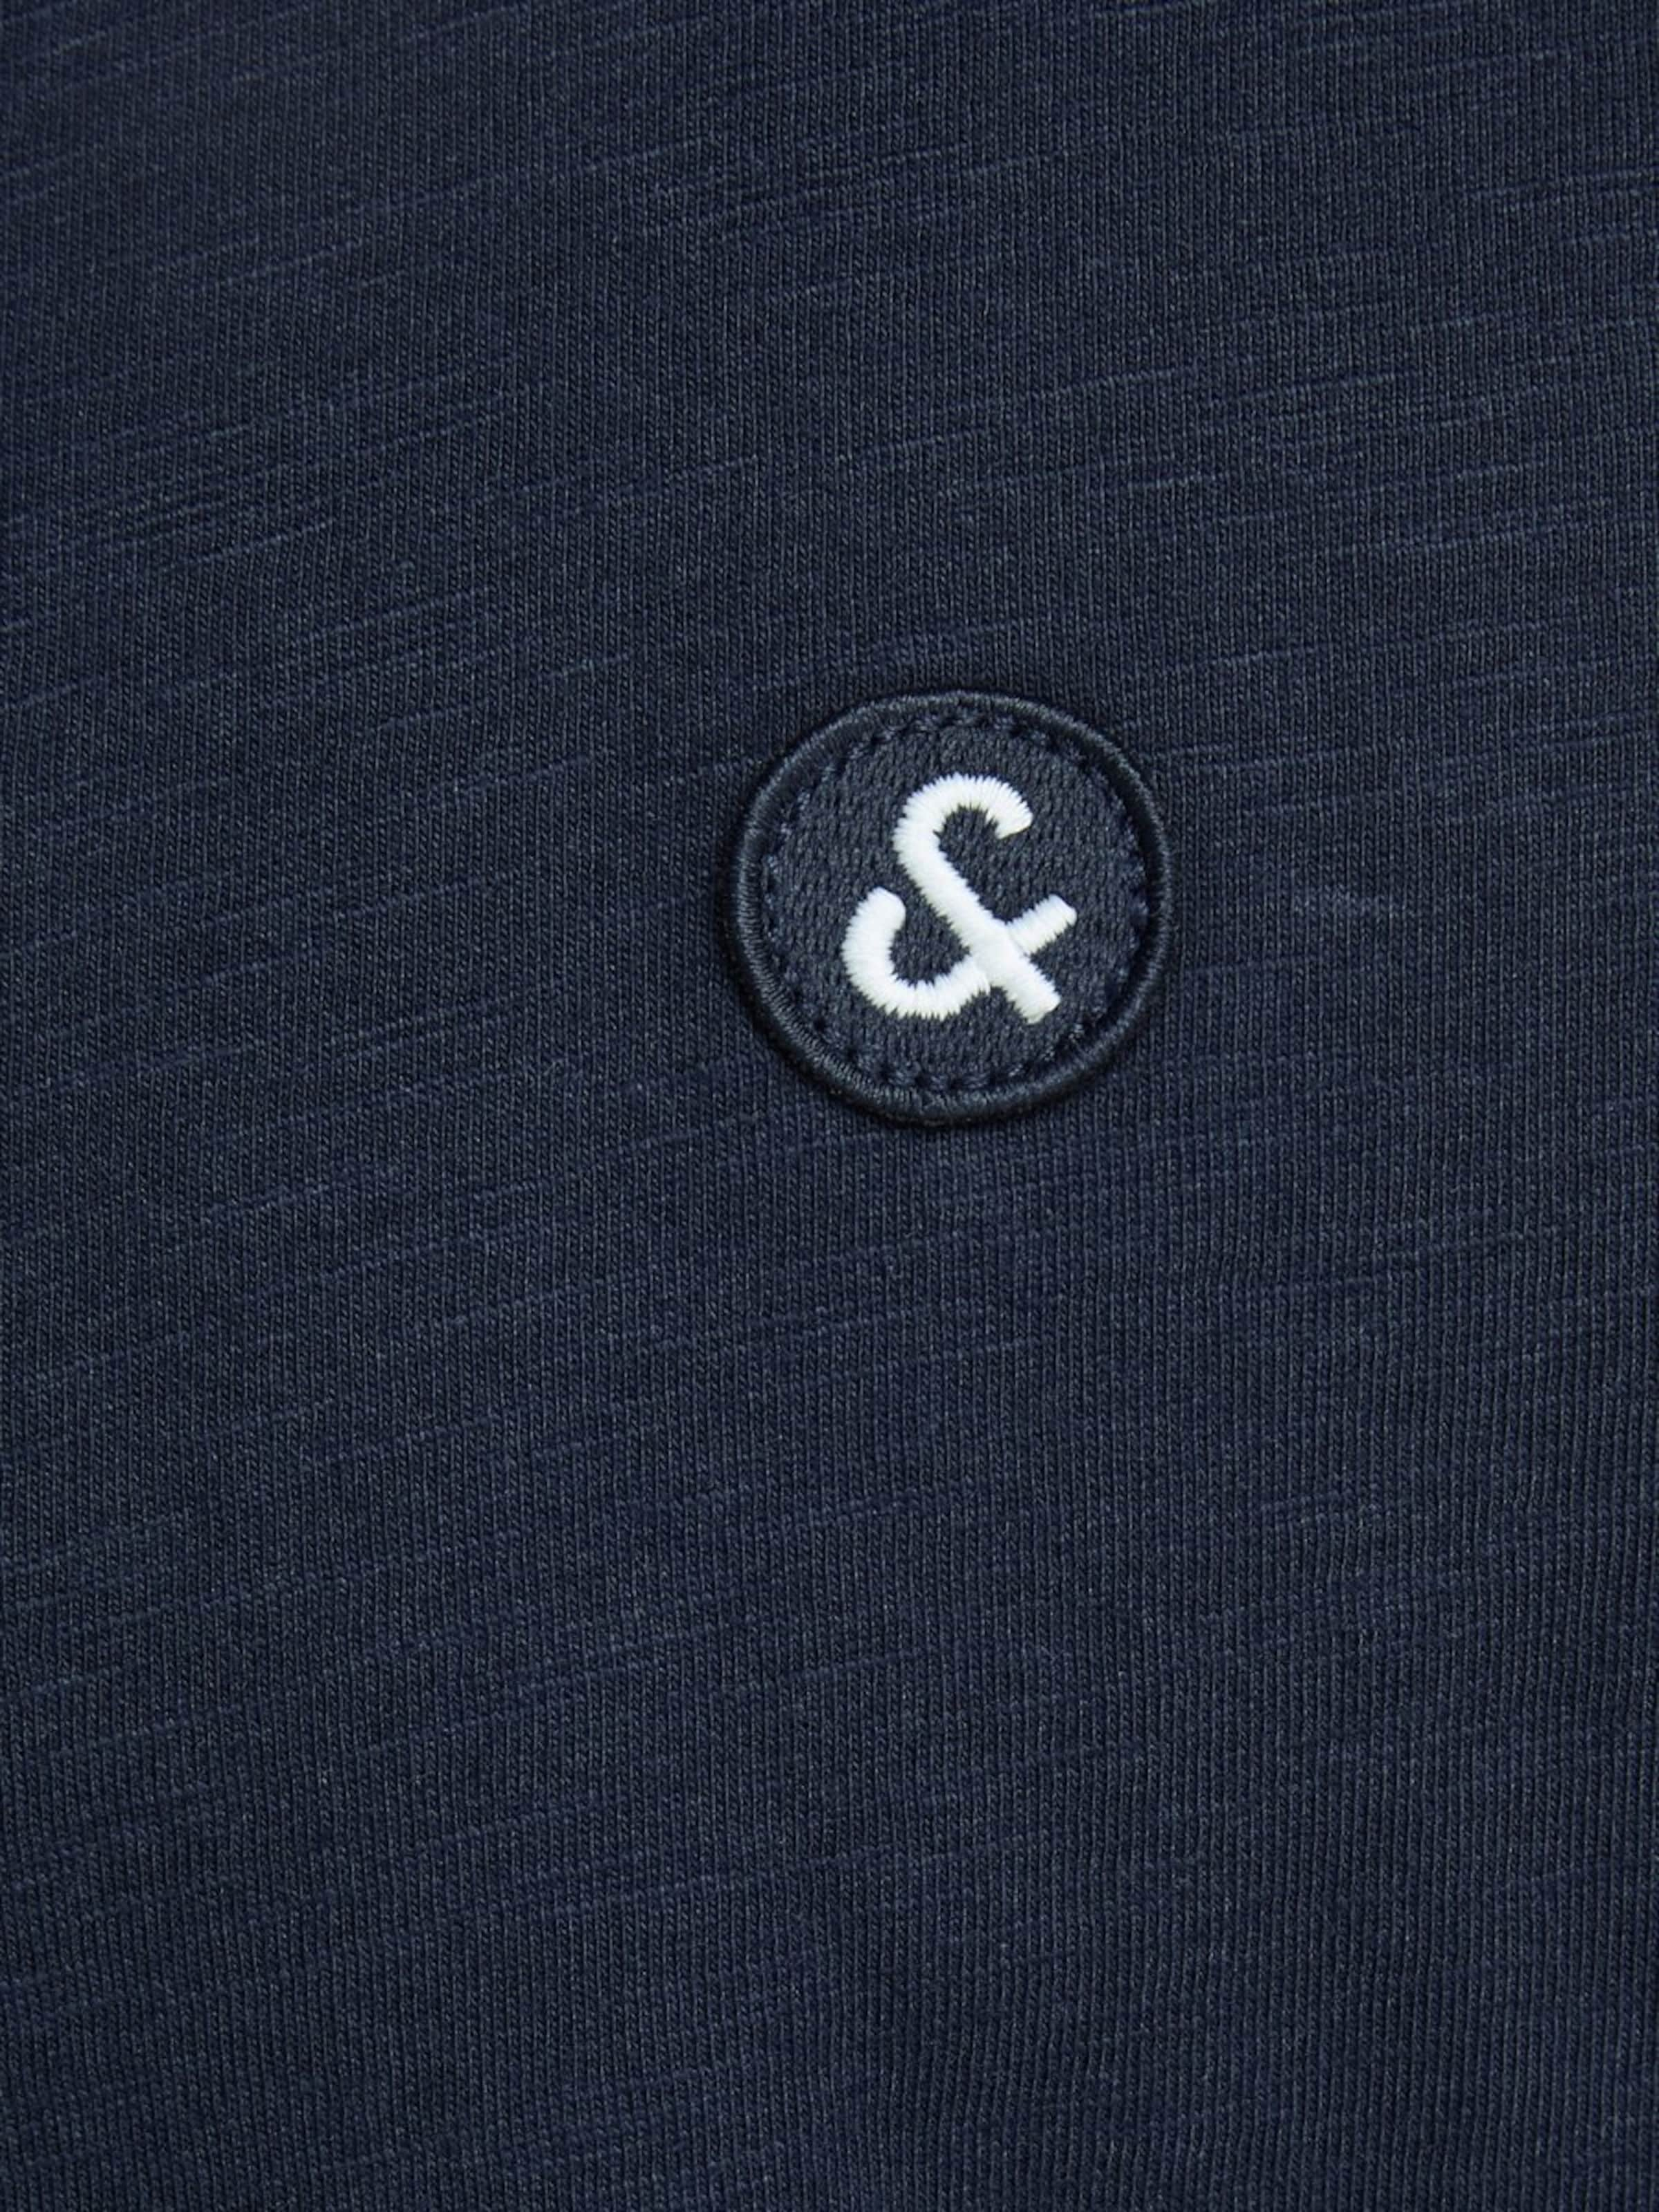 Jones shirt T En BleuGris Jackamp; Chiné Blanc 1FKJlc